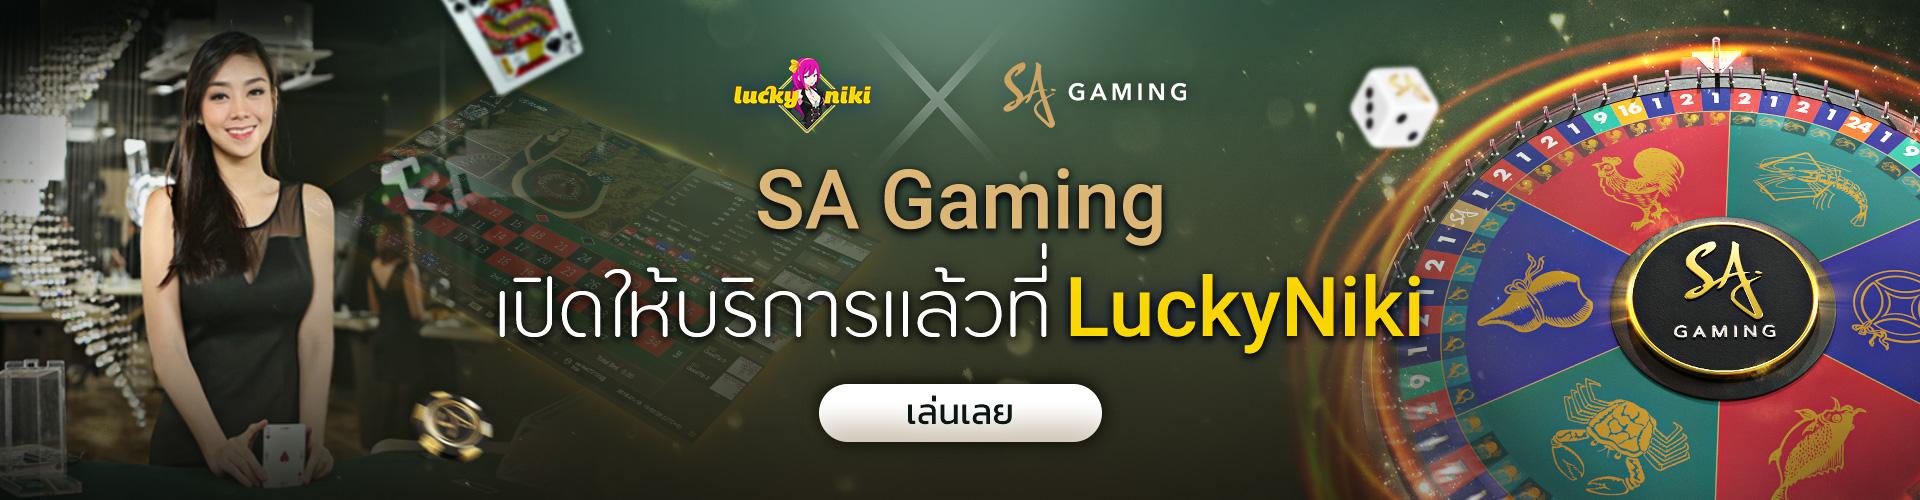 SA Gaming เปิดให้บริการแล้วที่ LuckyNiki วันนี้